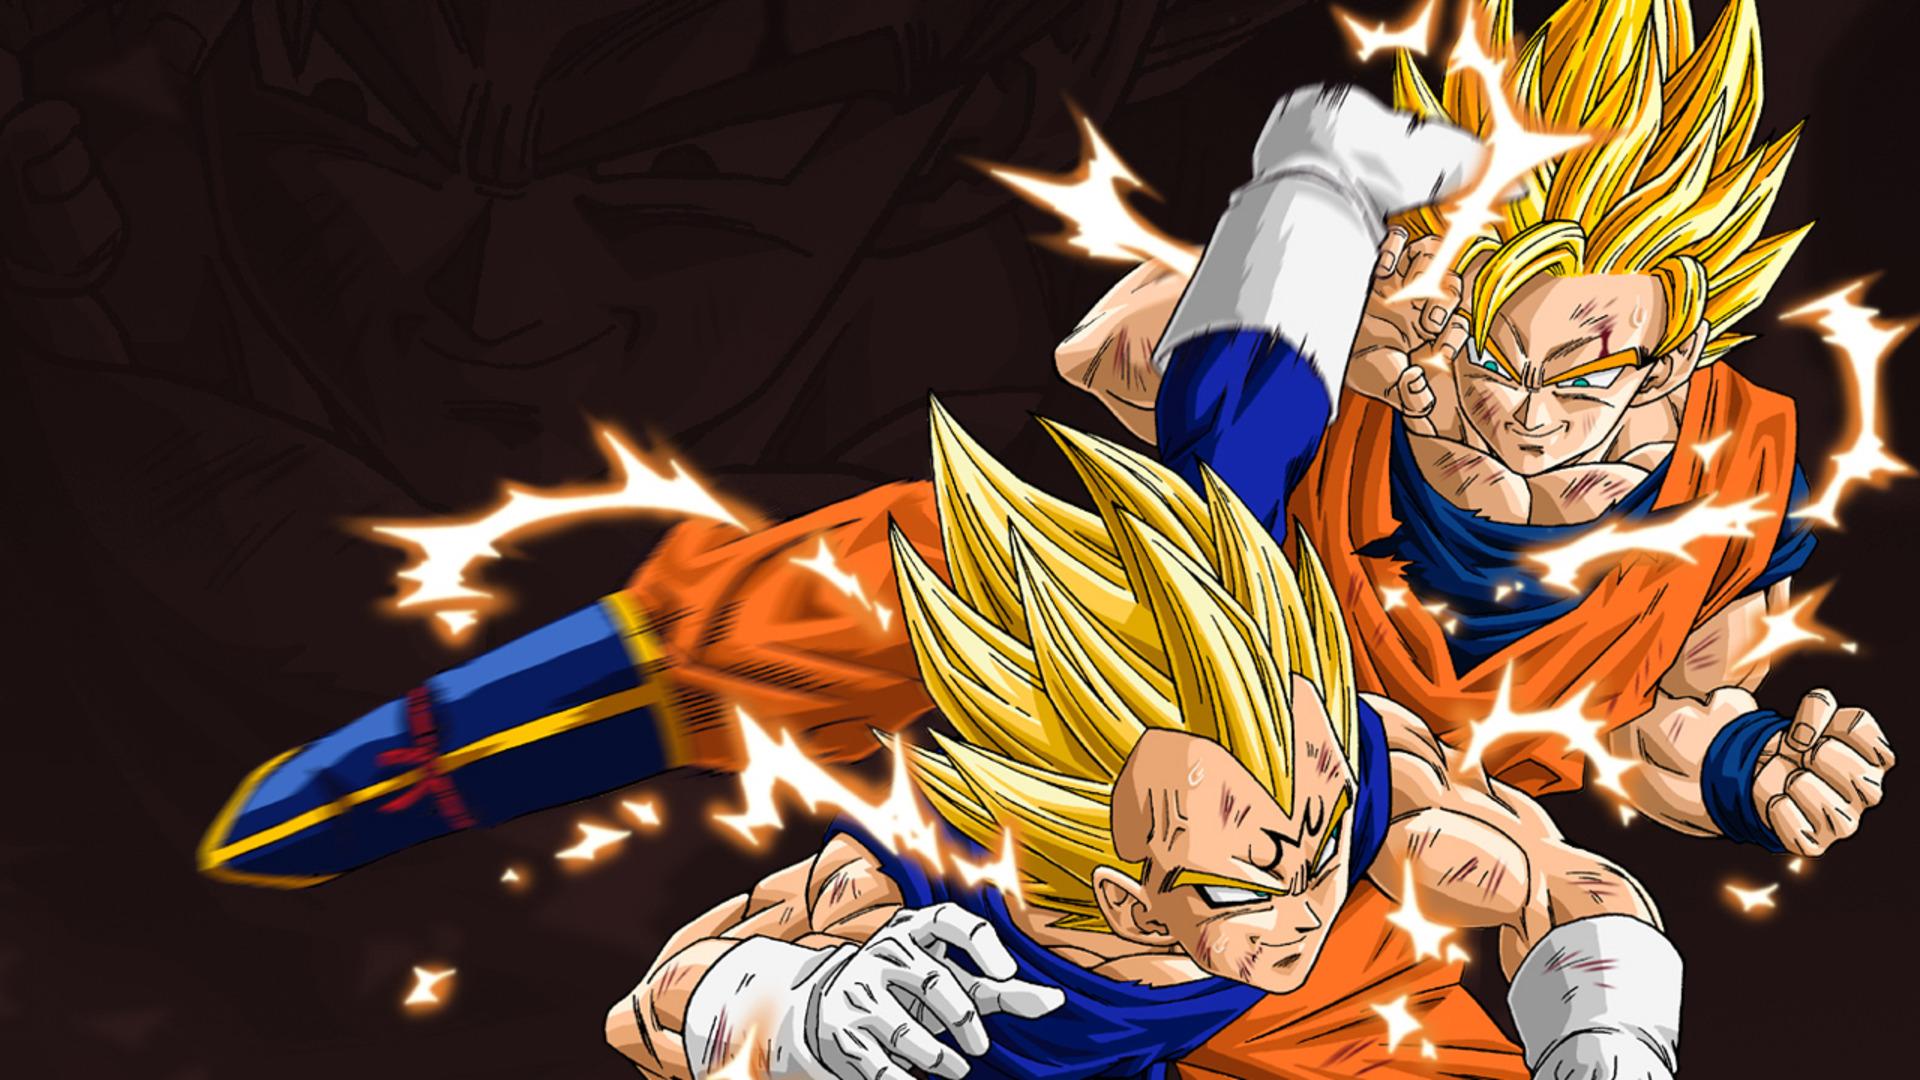 Goku Vegeta Wallpaper   Dragon Ball Z Wallpaper 35713309 1920x1080